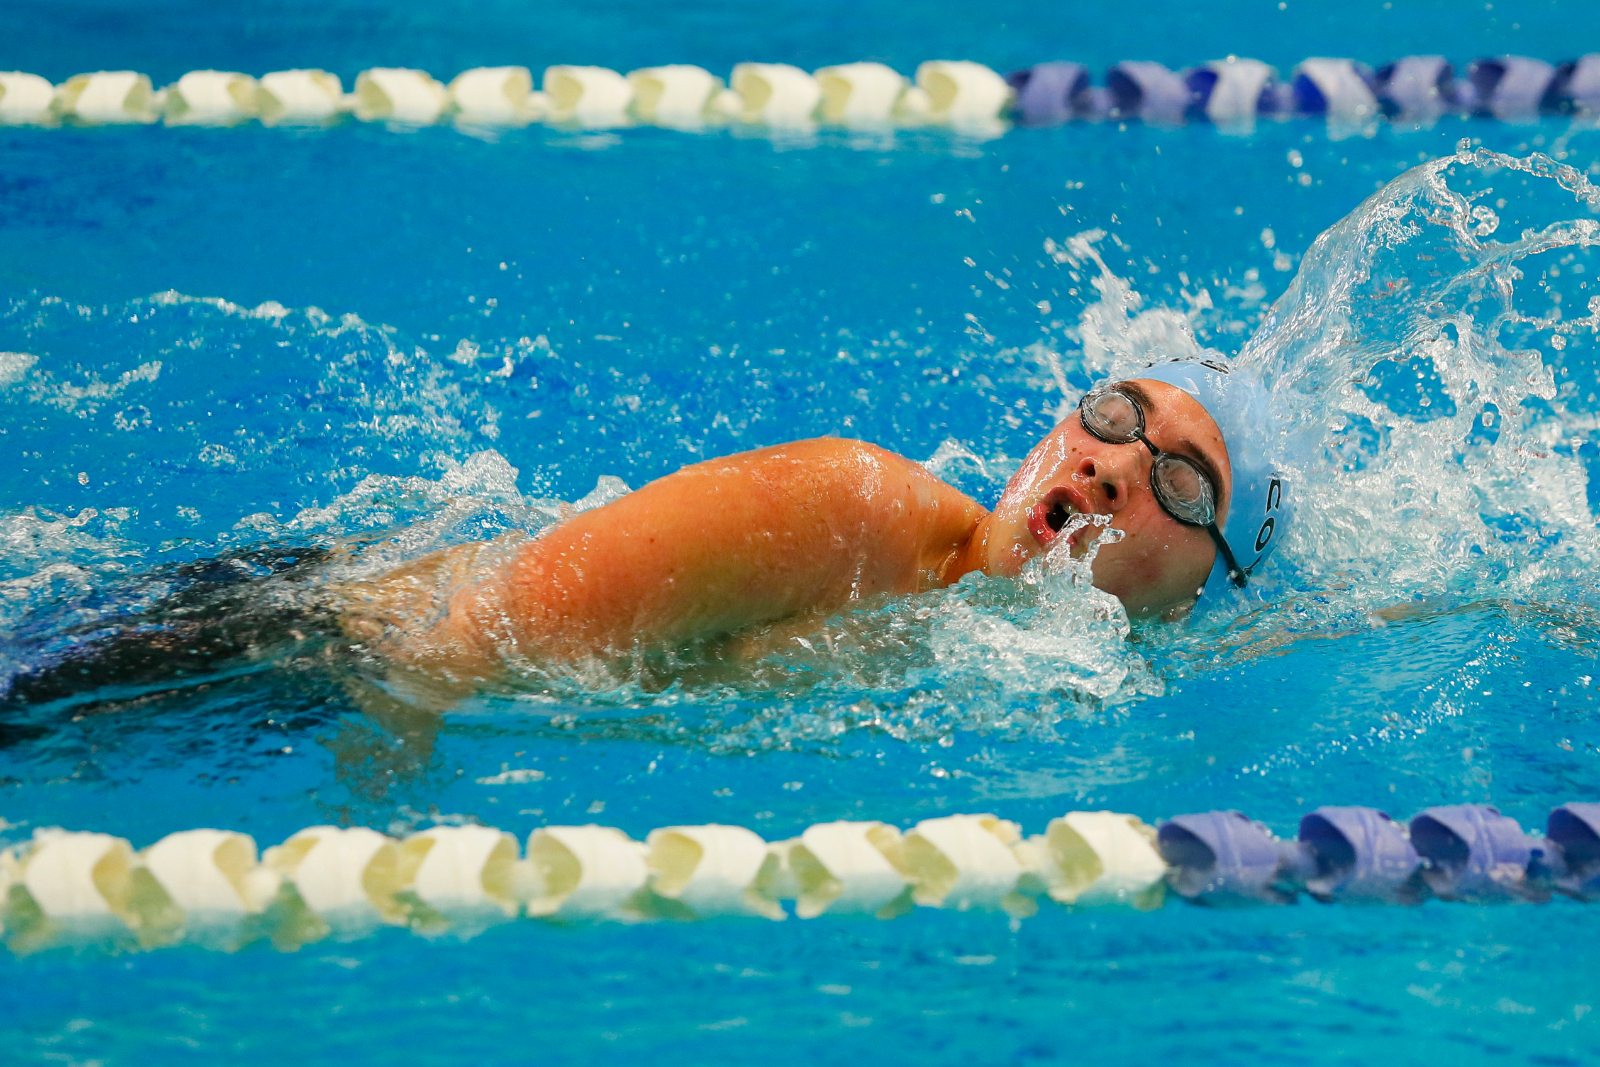 Trojans Hire Swim and Dive Coach